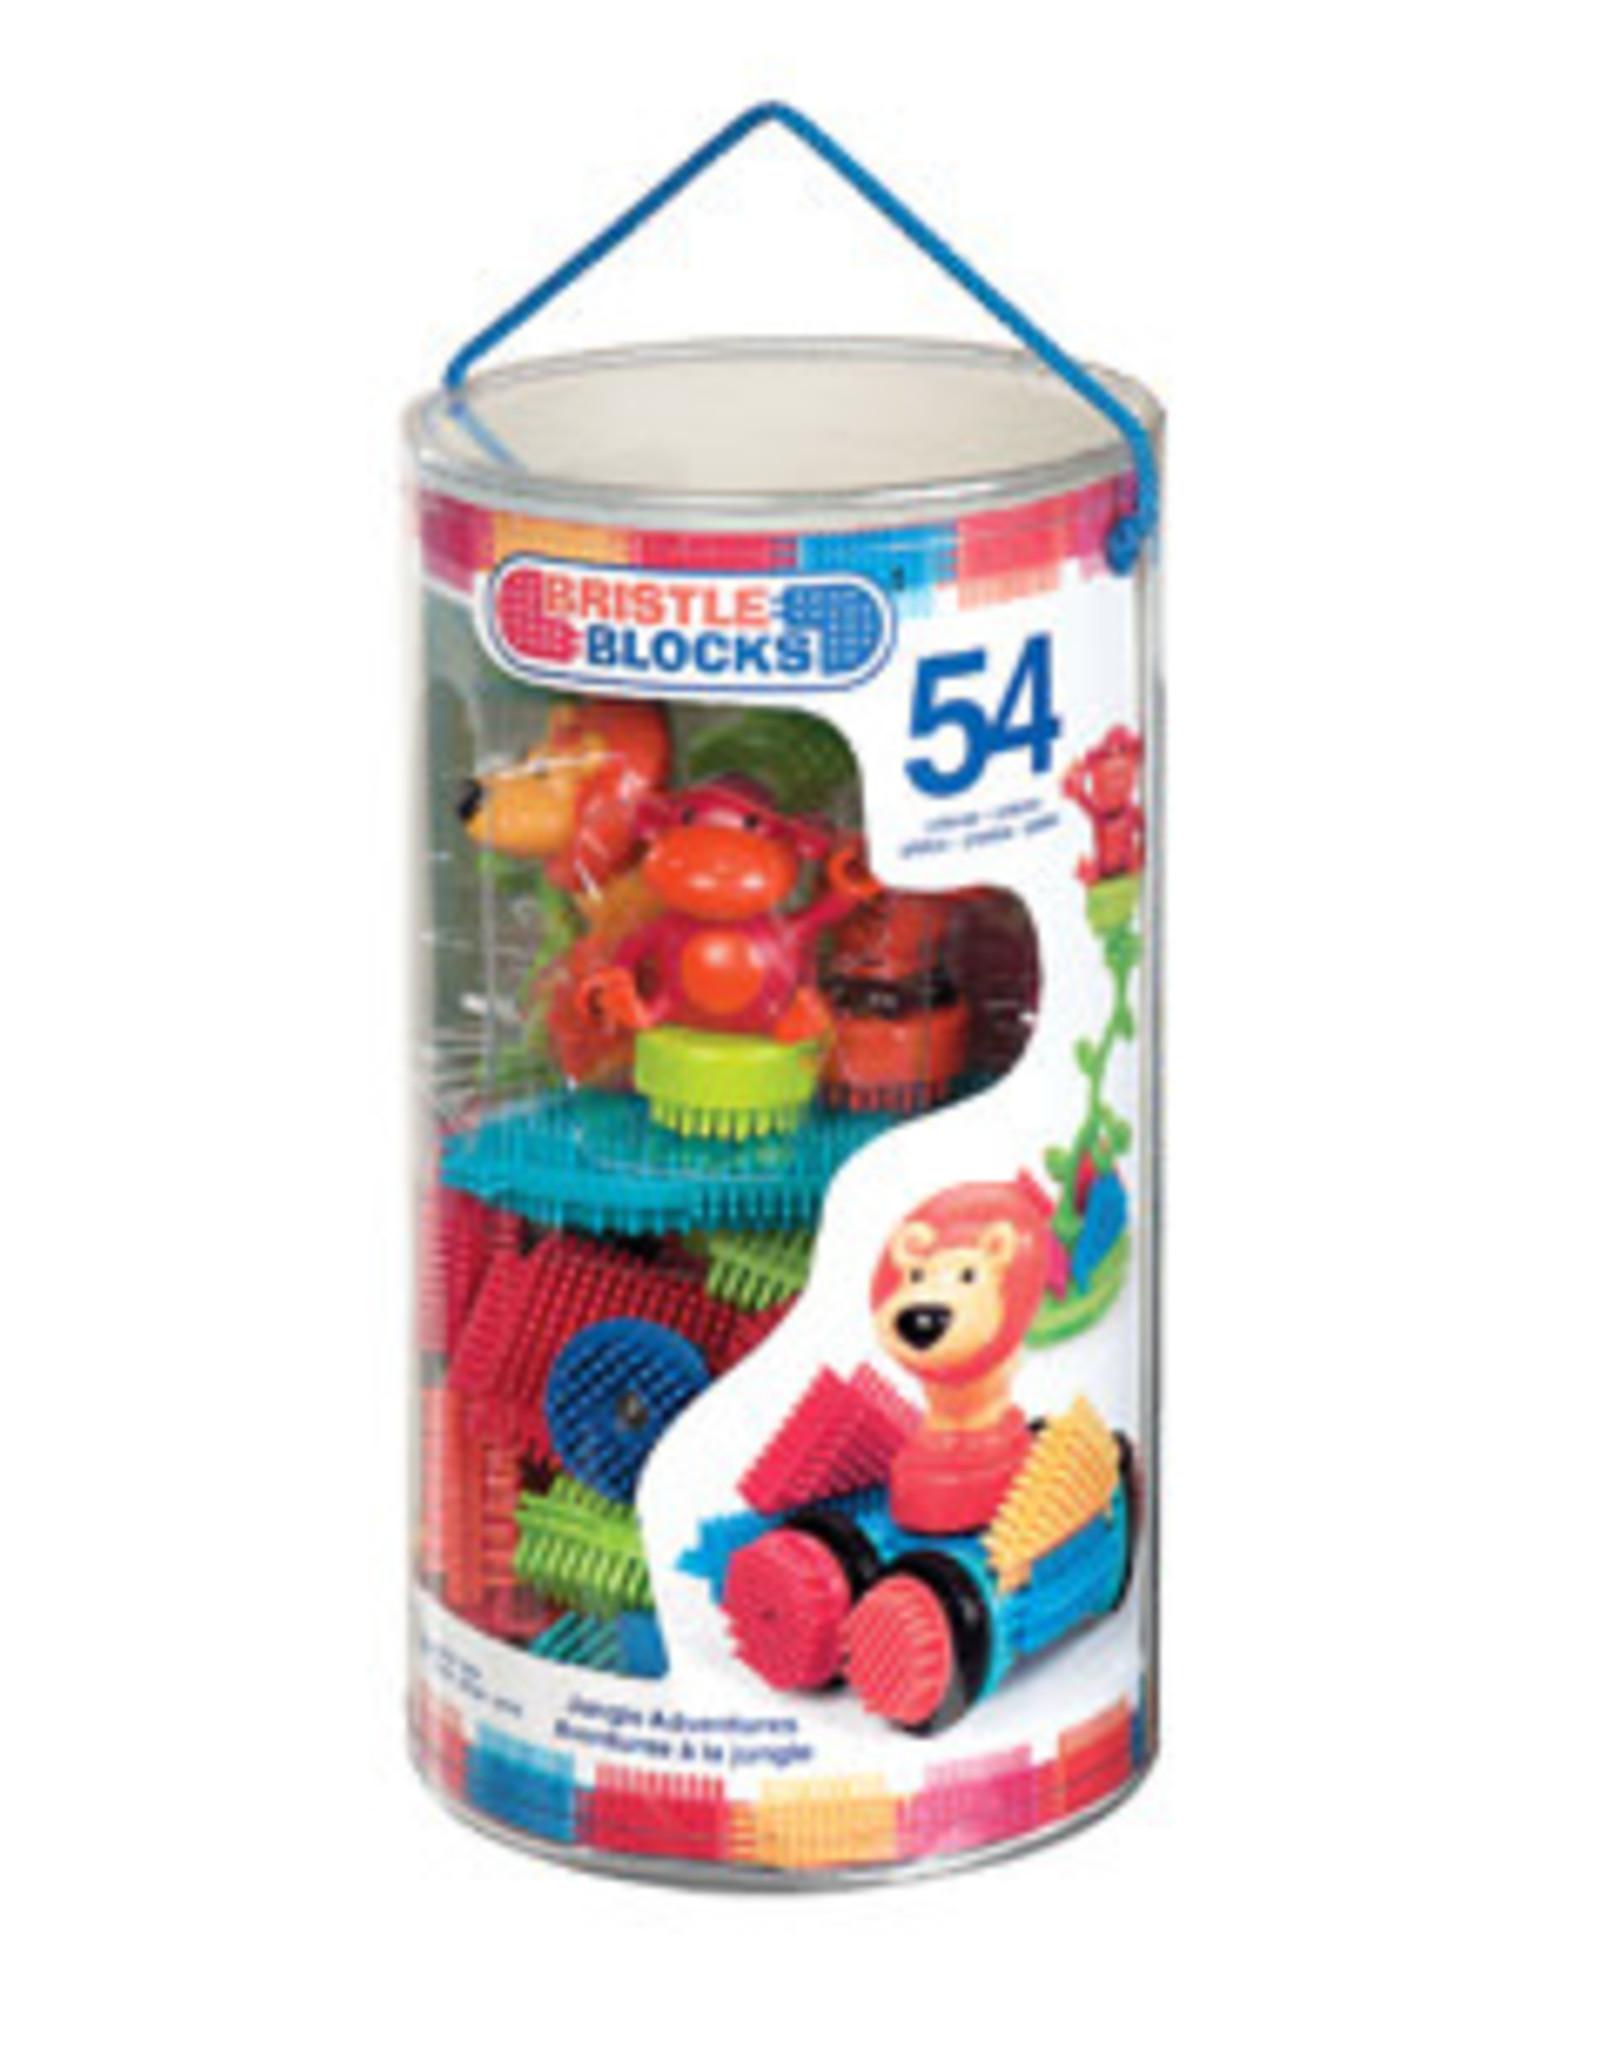 B.toys Bristle Blocks Jungle adventures 54 stukjes